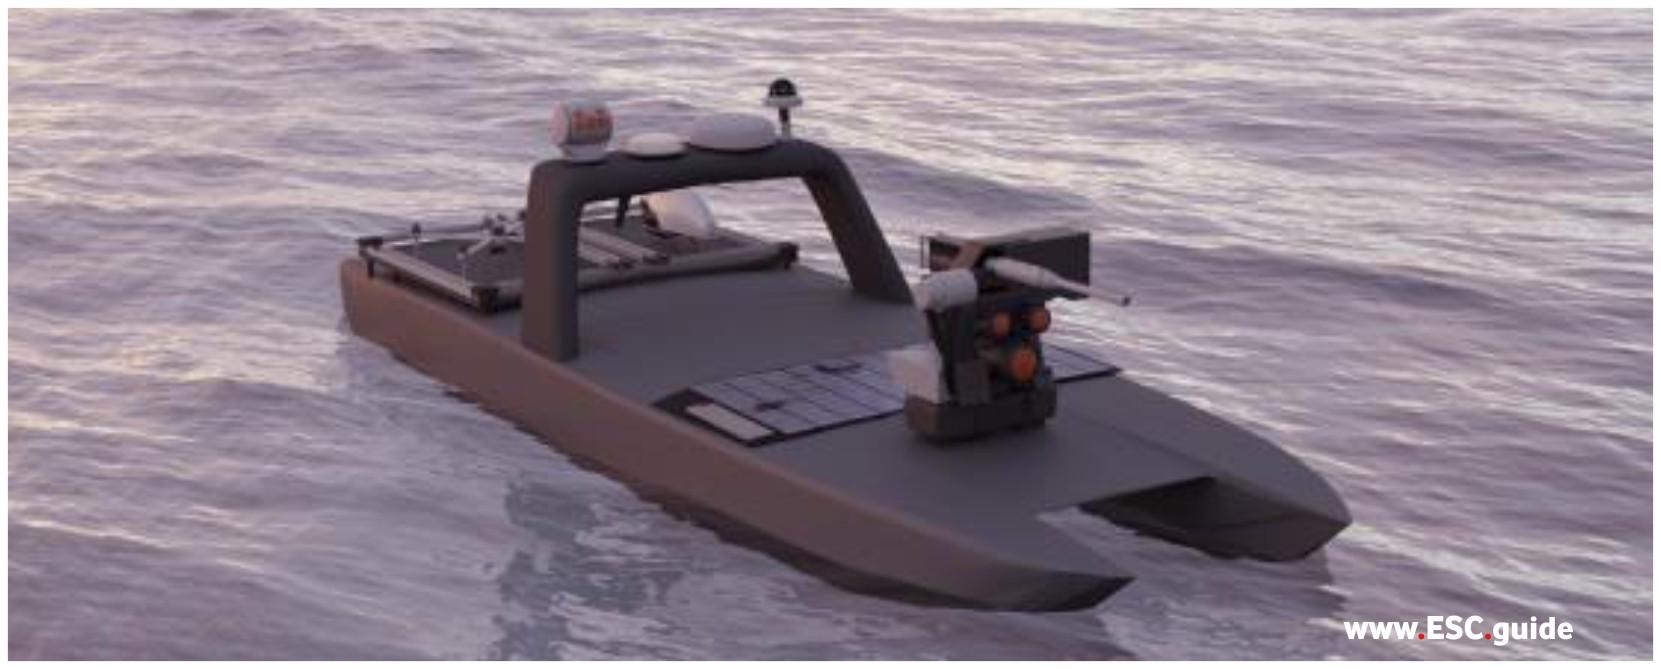 Configuration: MANTAS T38 Defender.